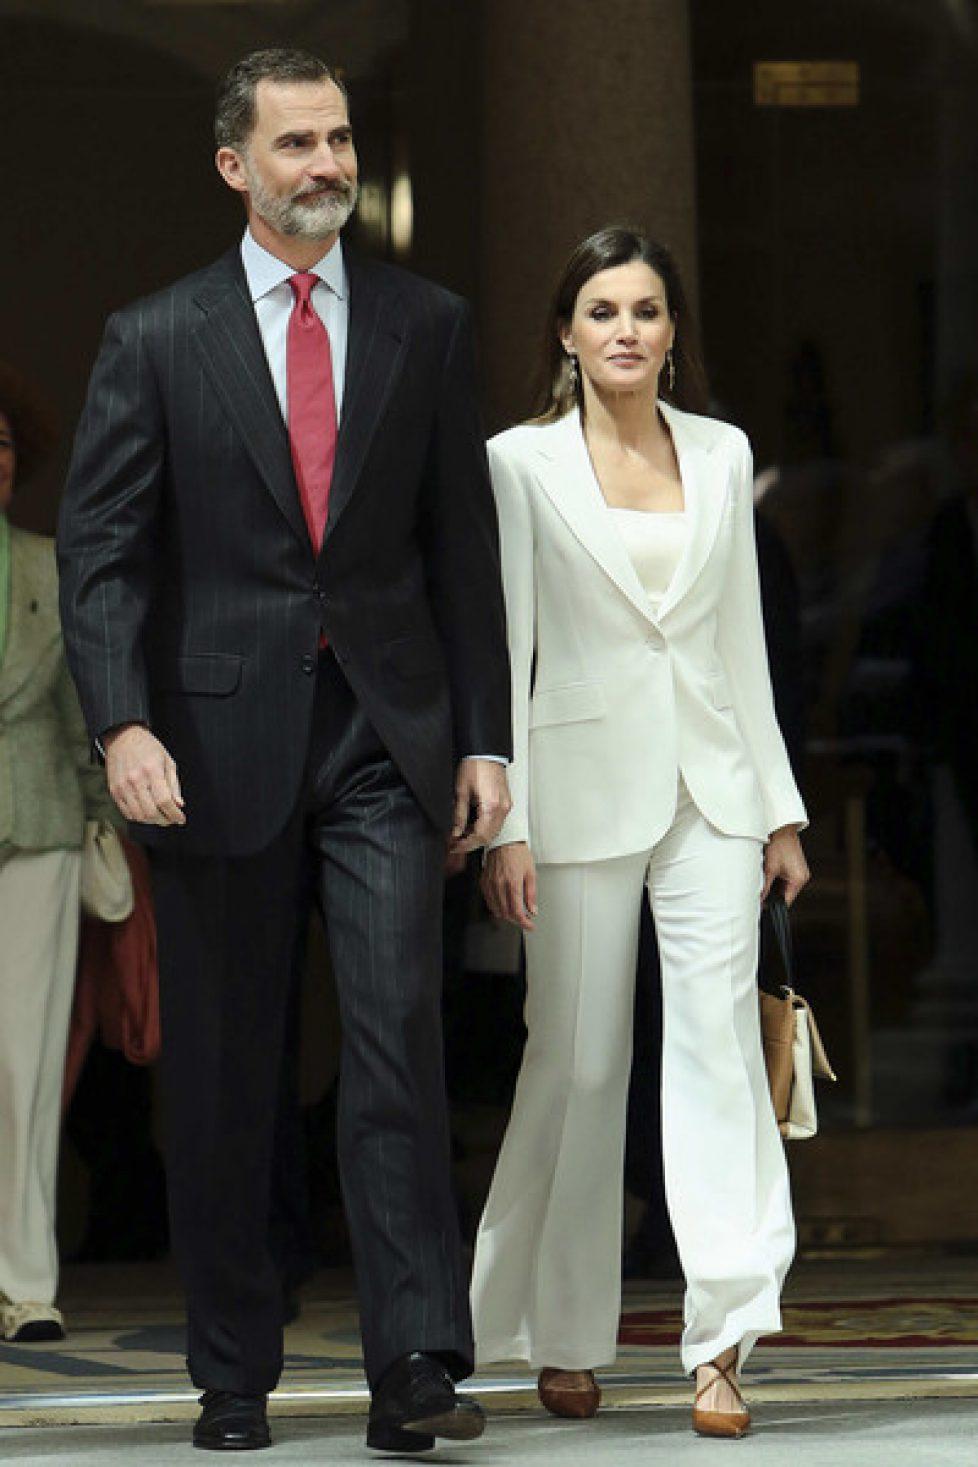 Spanish+Royals+Attend+Presentation+BDE+Madrid+fg_0LPN8Ah_l